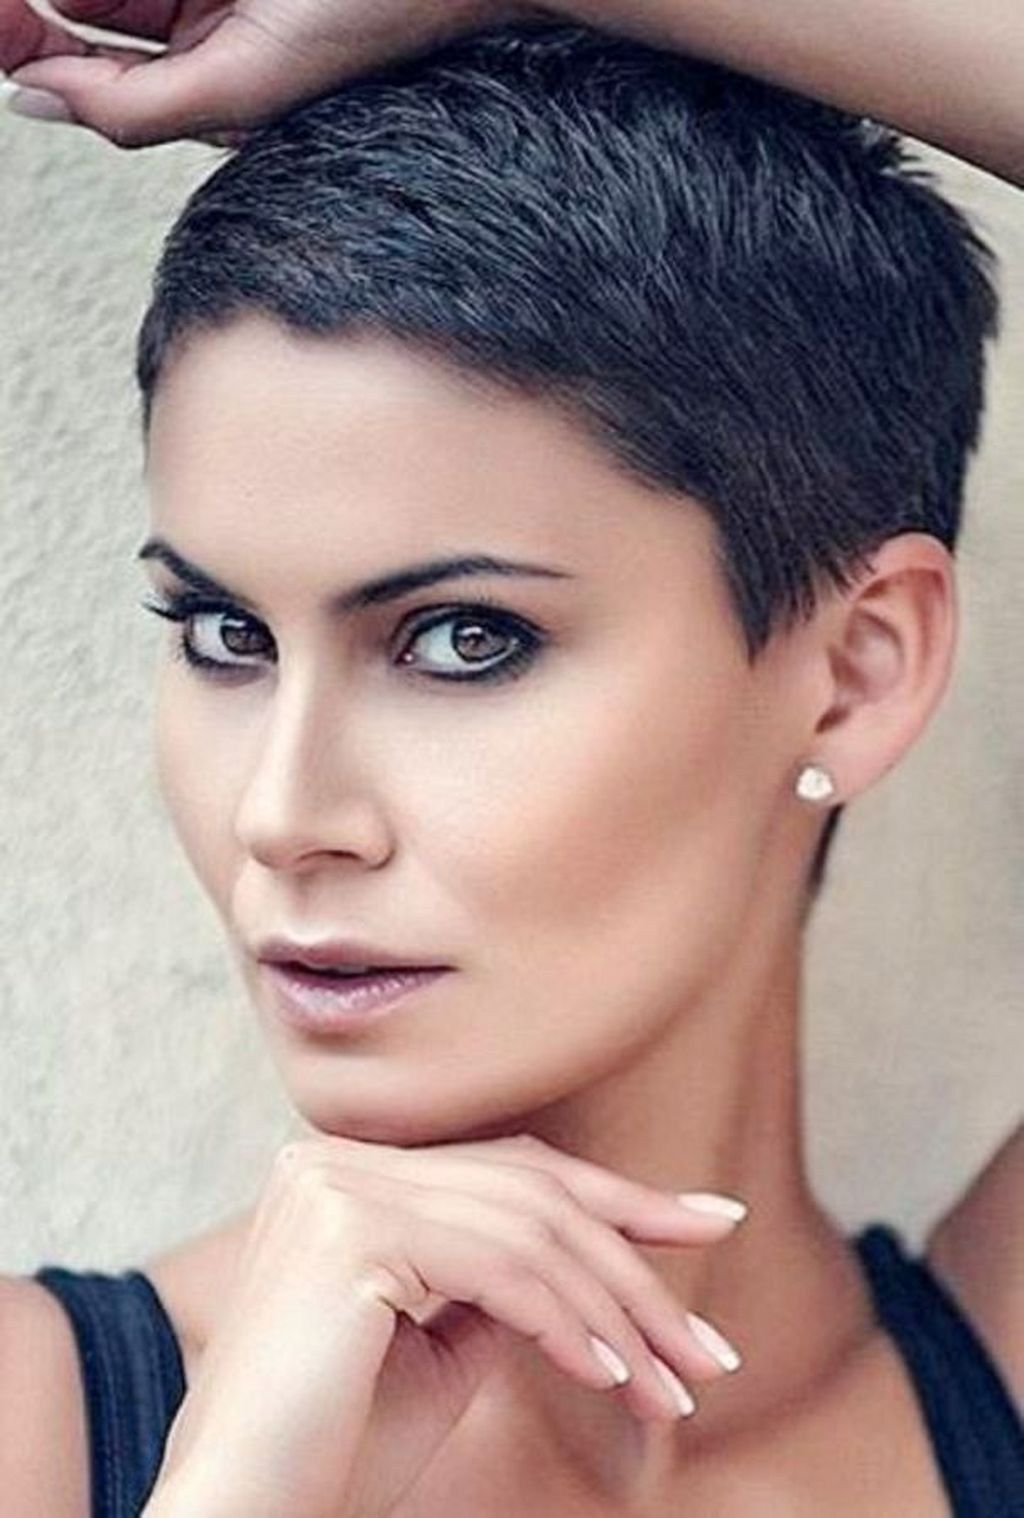 Fashionable Pixie Haircut Ideas For Spring Hair in